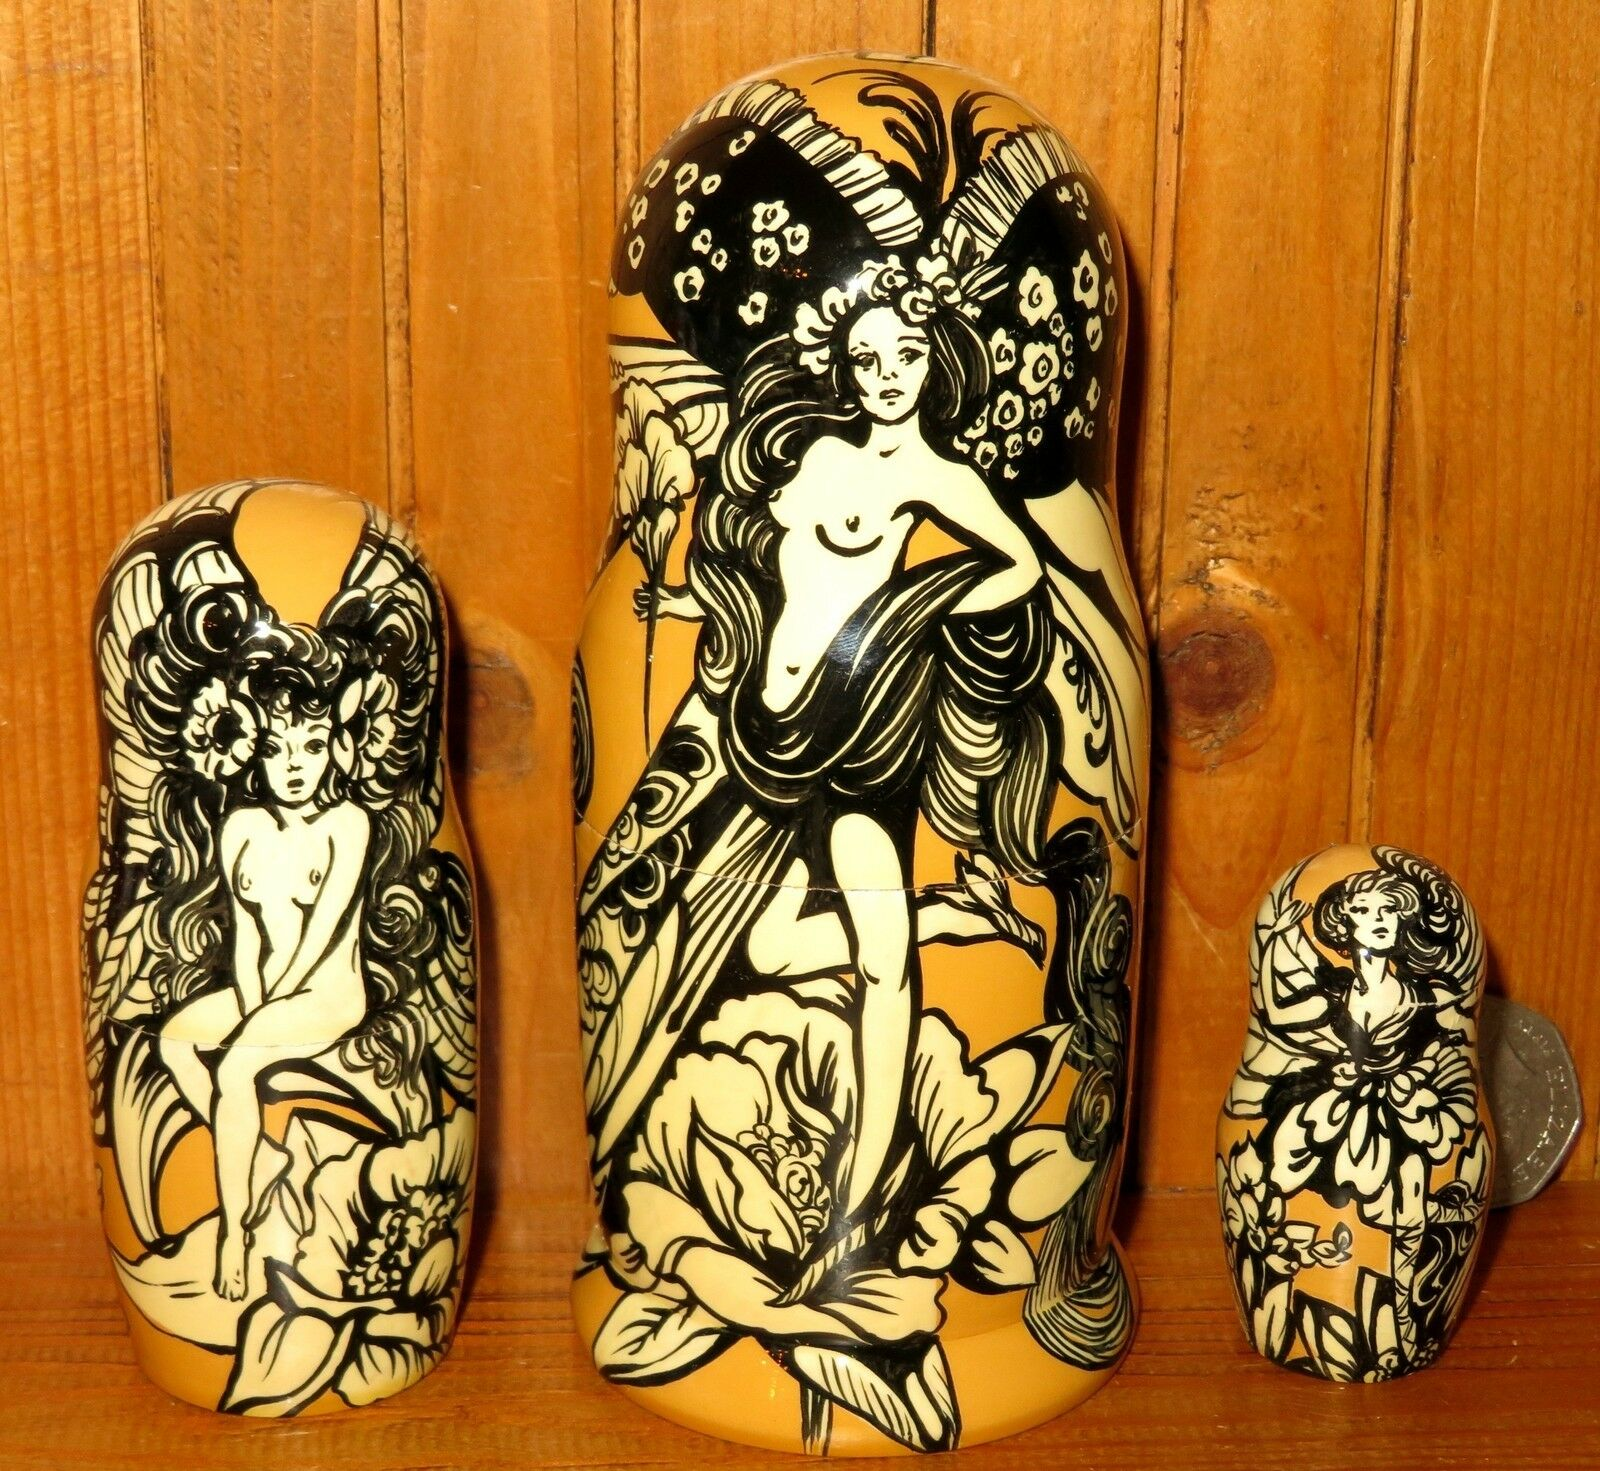 Nidification poupées Russes Matryoshka Babushka 3 Butterfly Fairy girls Magic signé